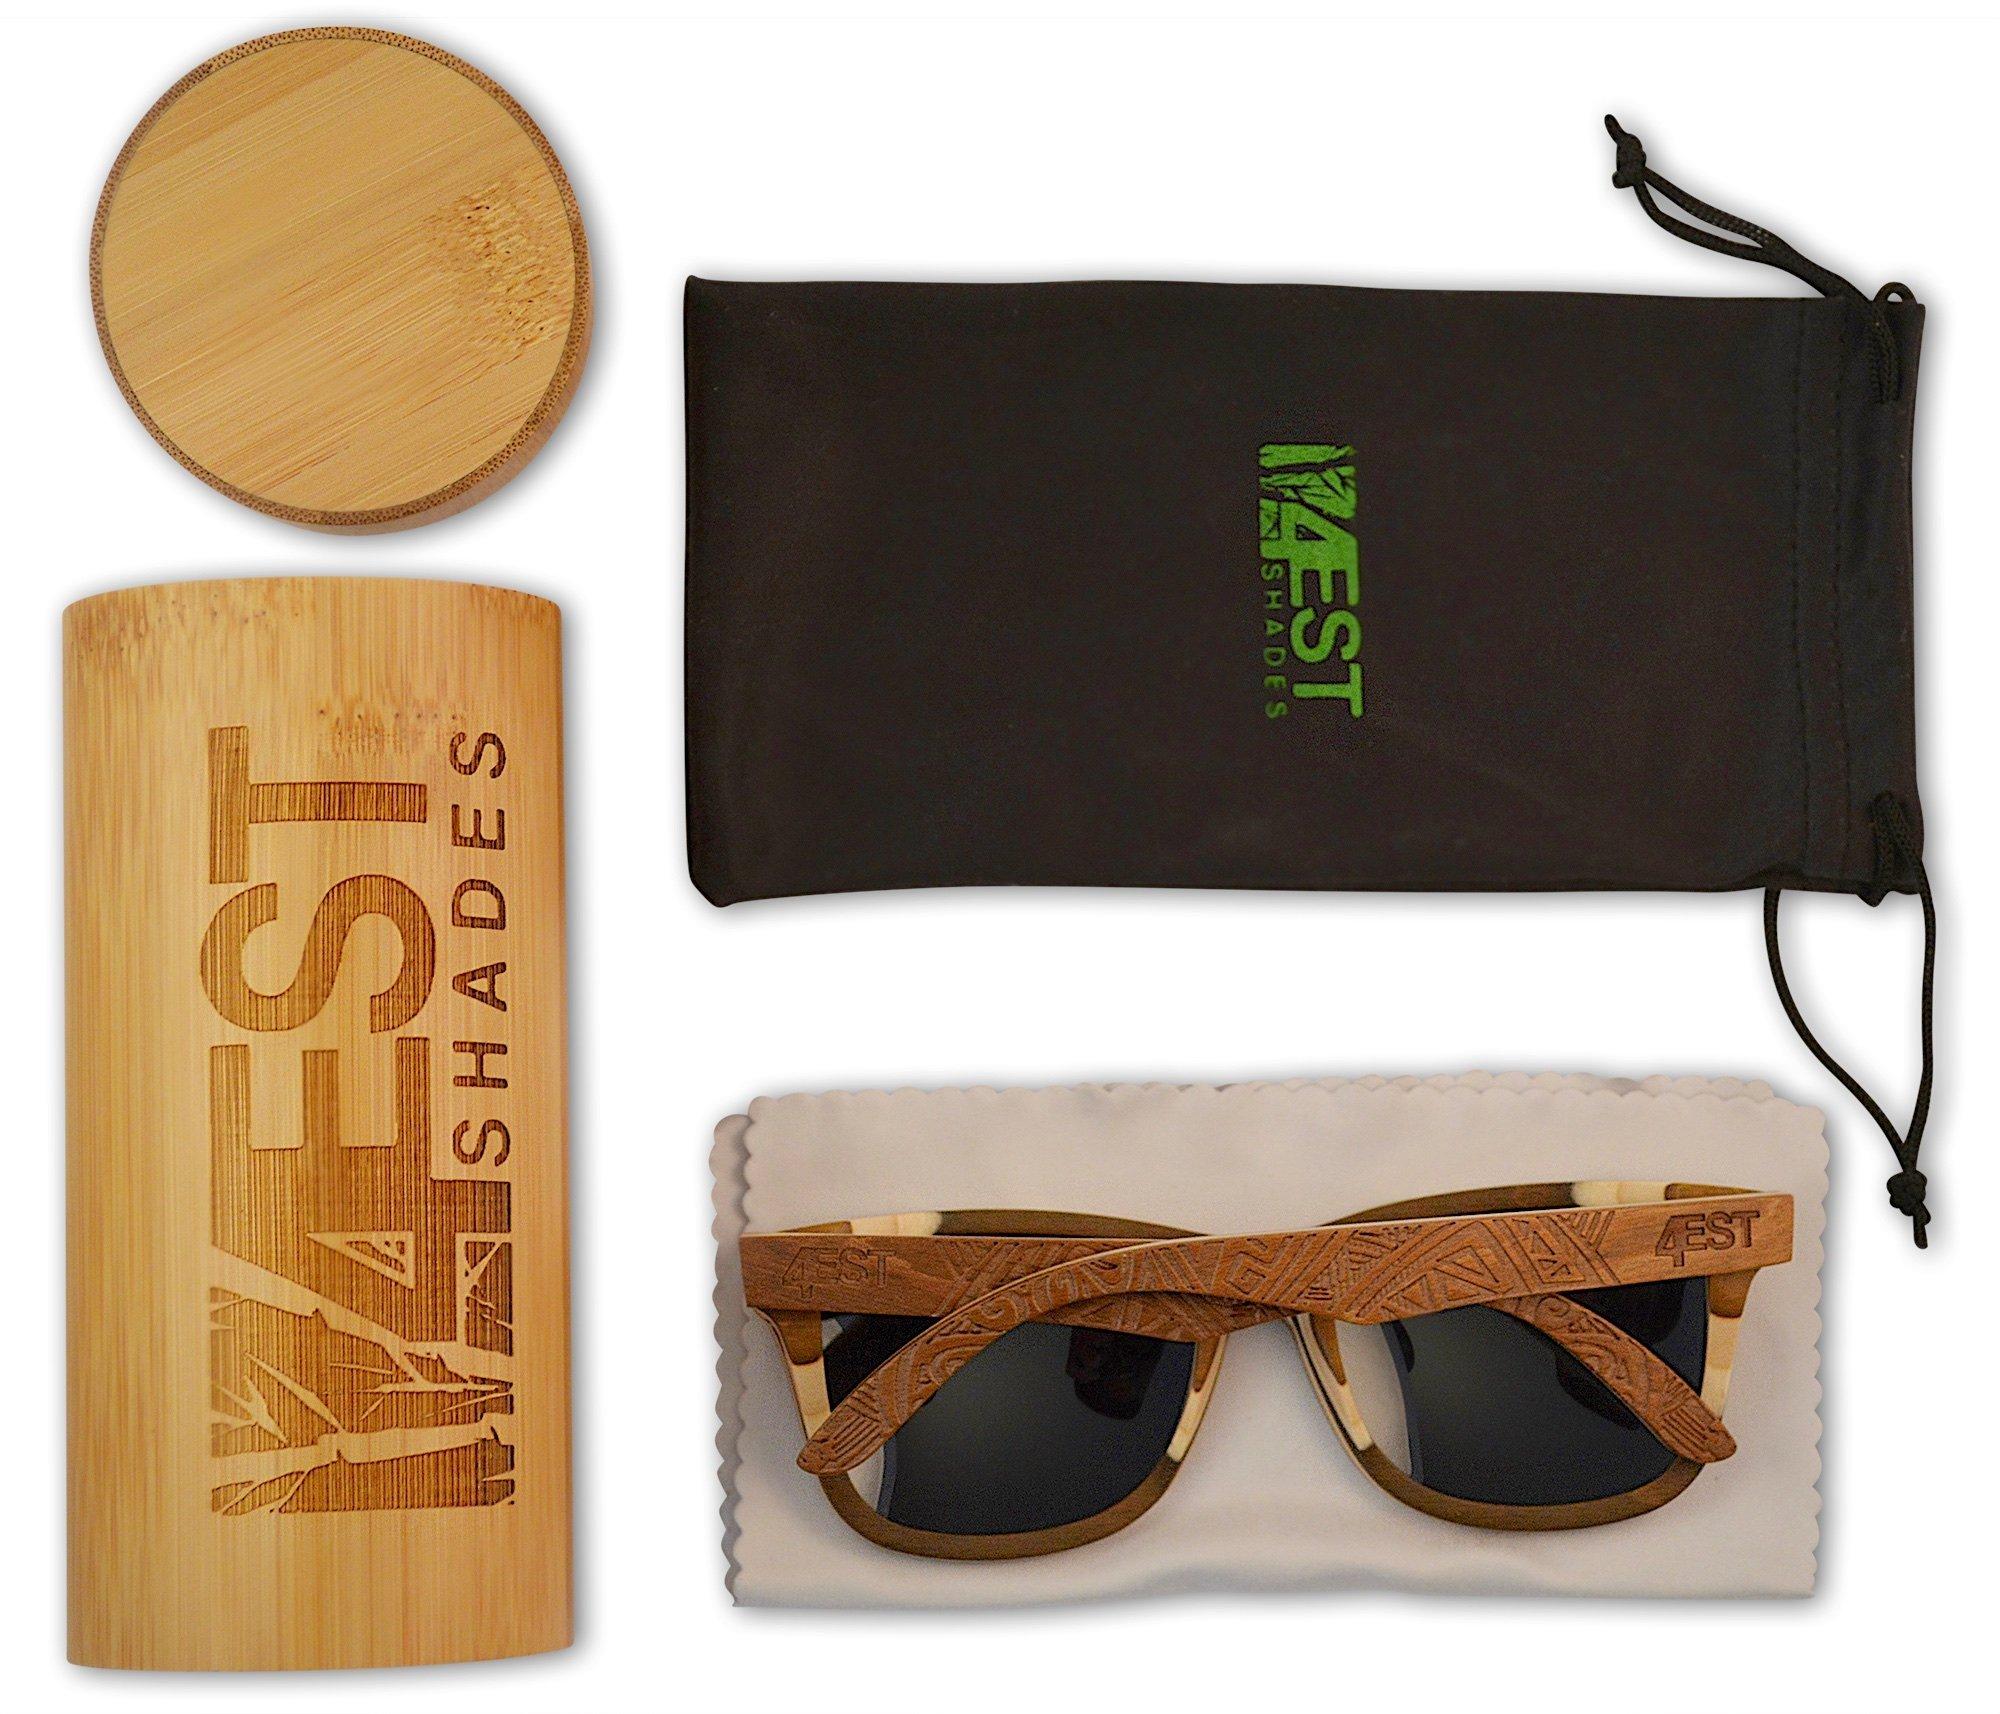 bfb4db3af5 4est Shades Polarized Lenses Wood Sunglass